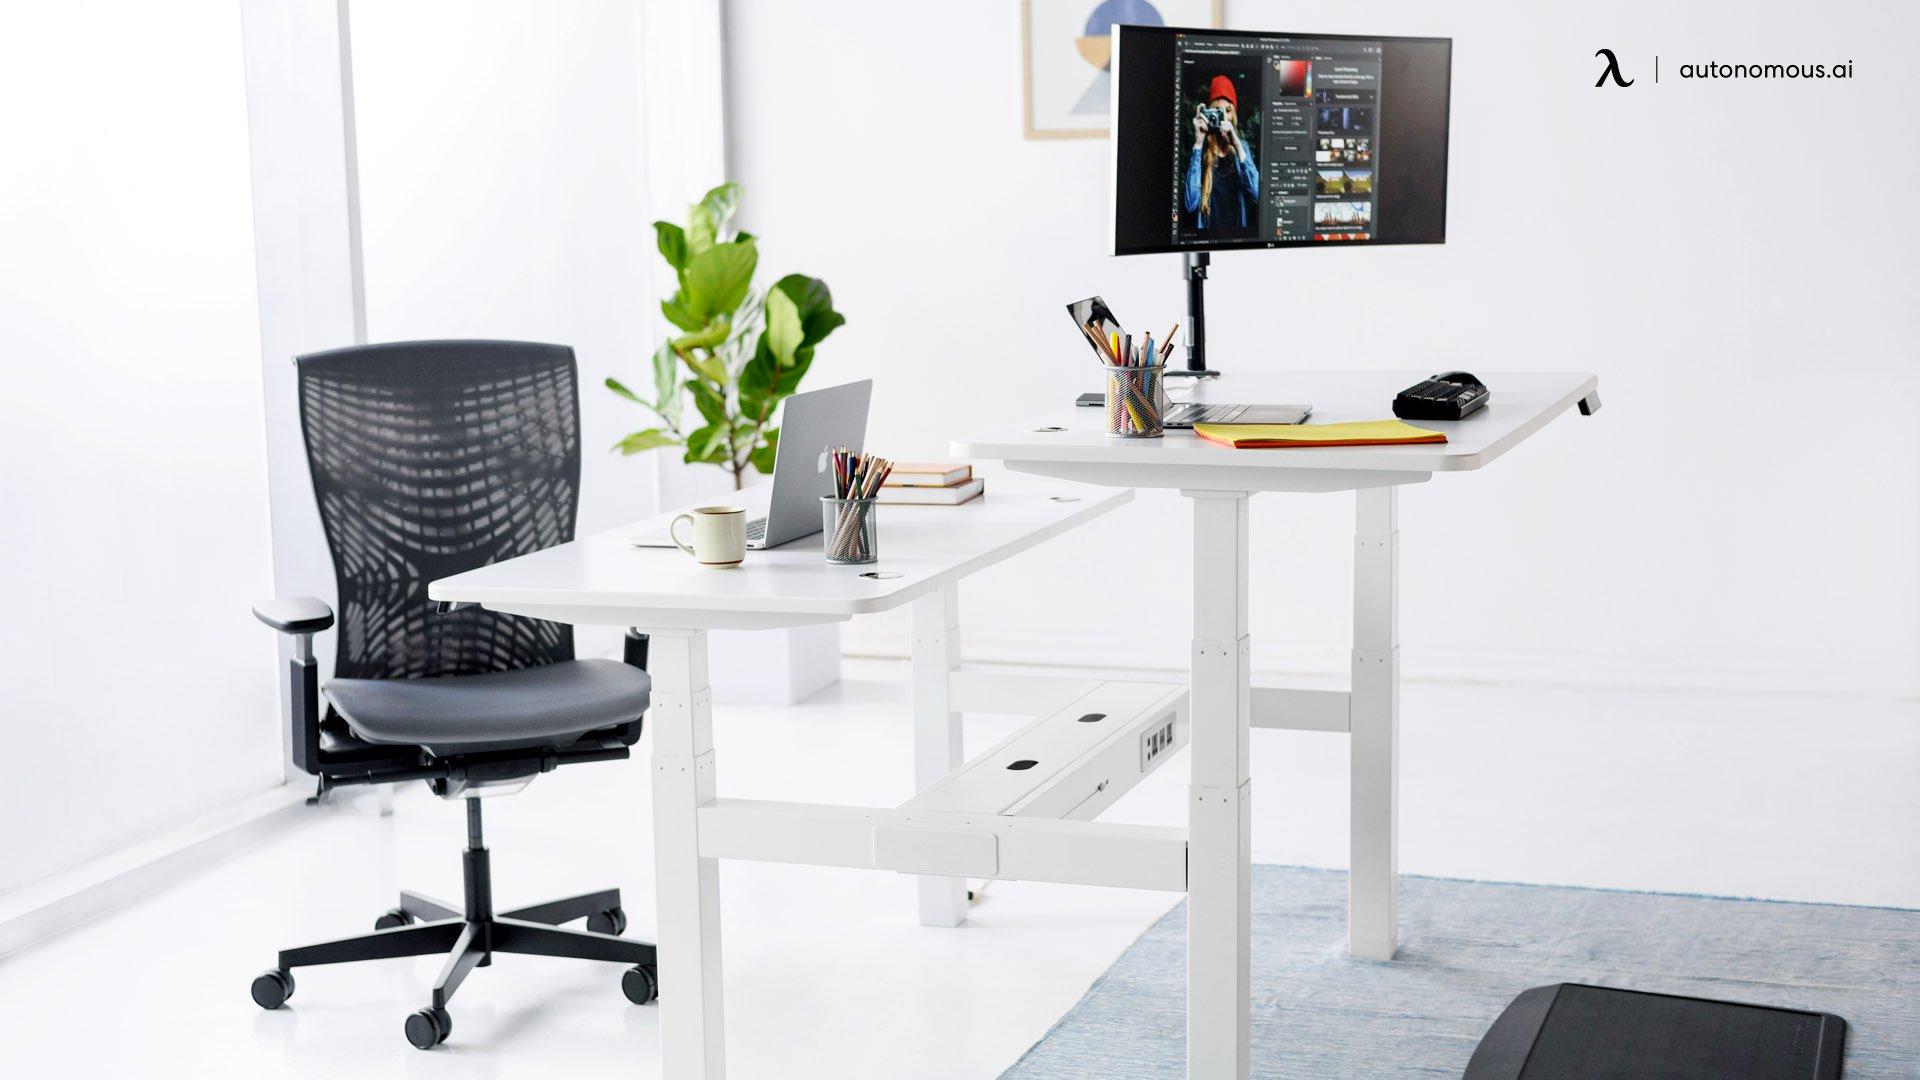 Invest in ergonomic chairs